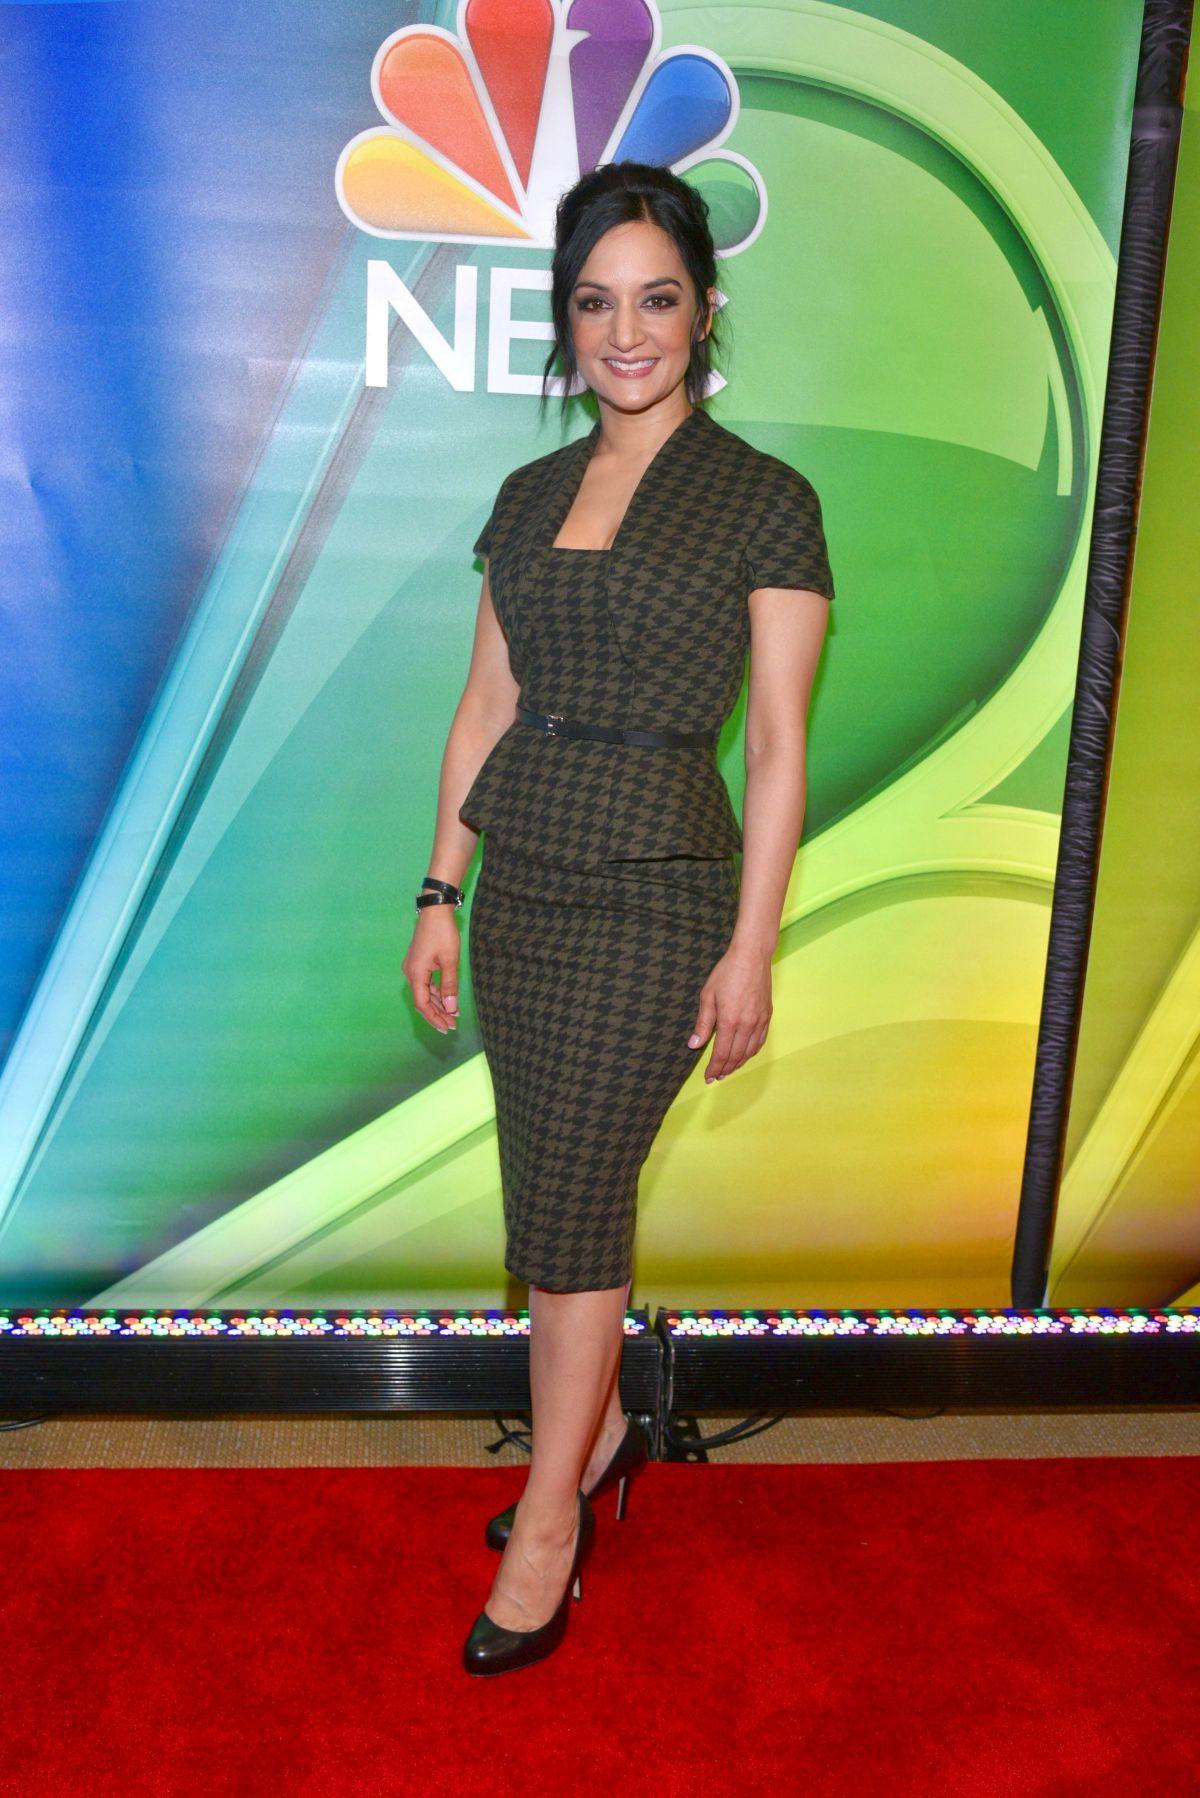 ARCHIE PANJABI at NBC/Universal Mid Season Press Day 03/02/2017